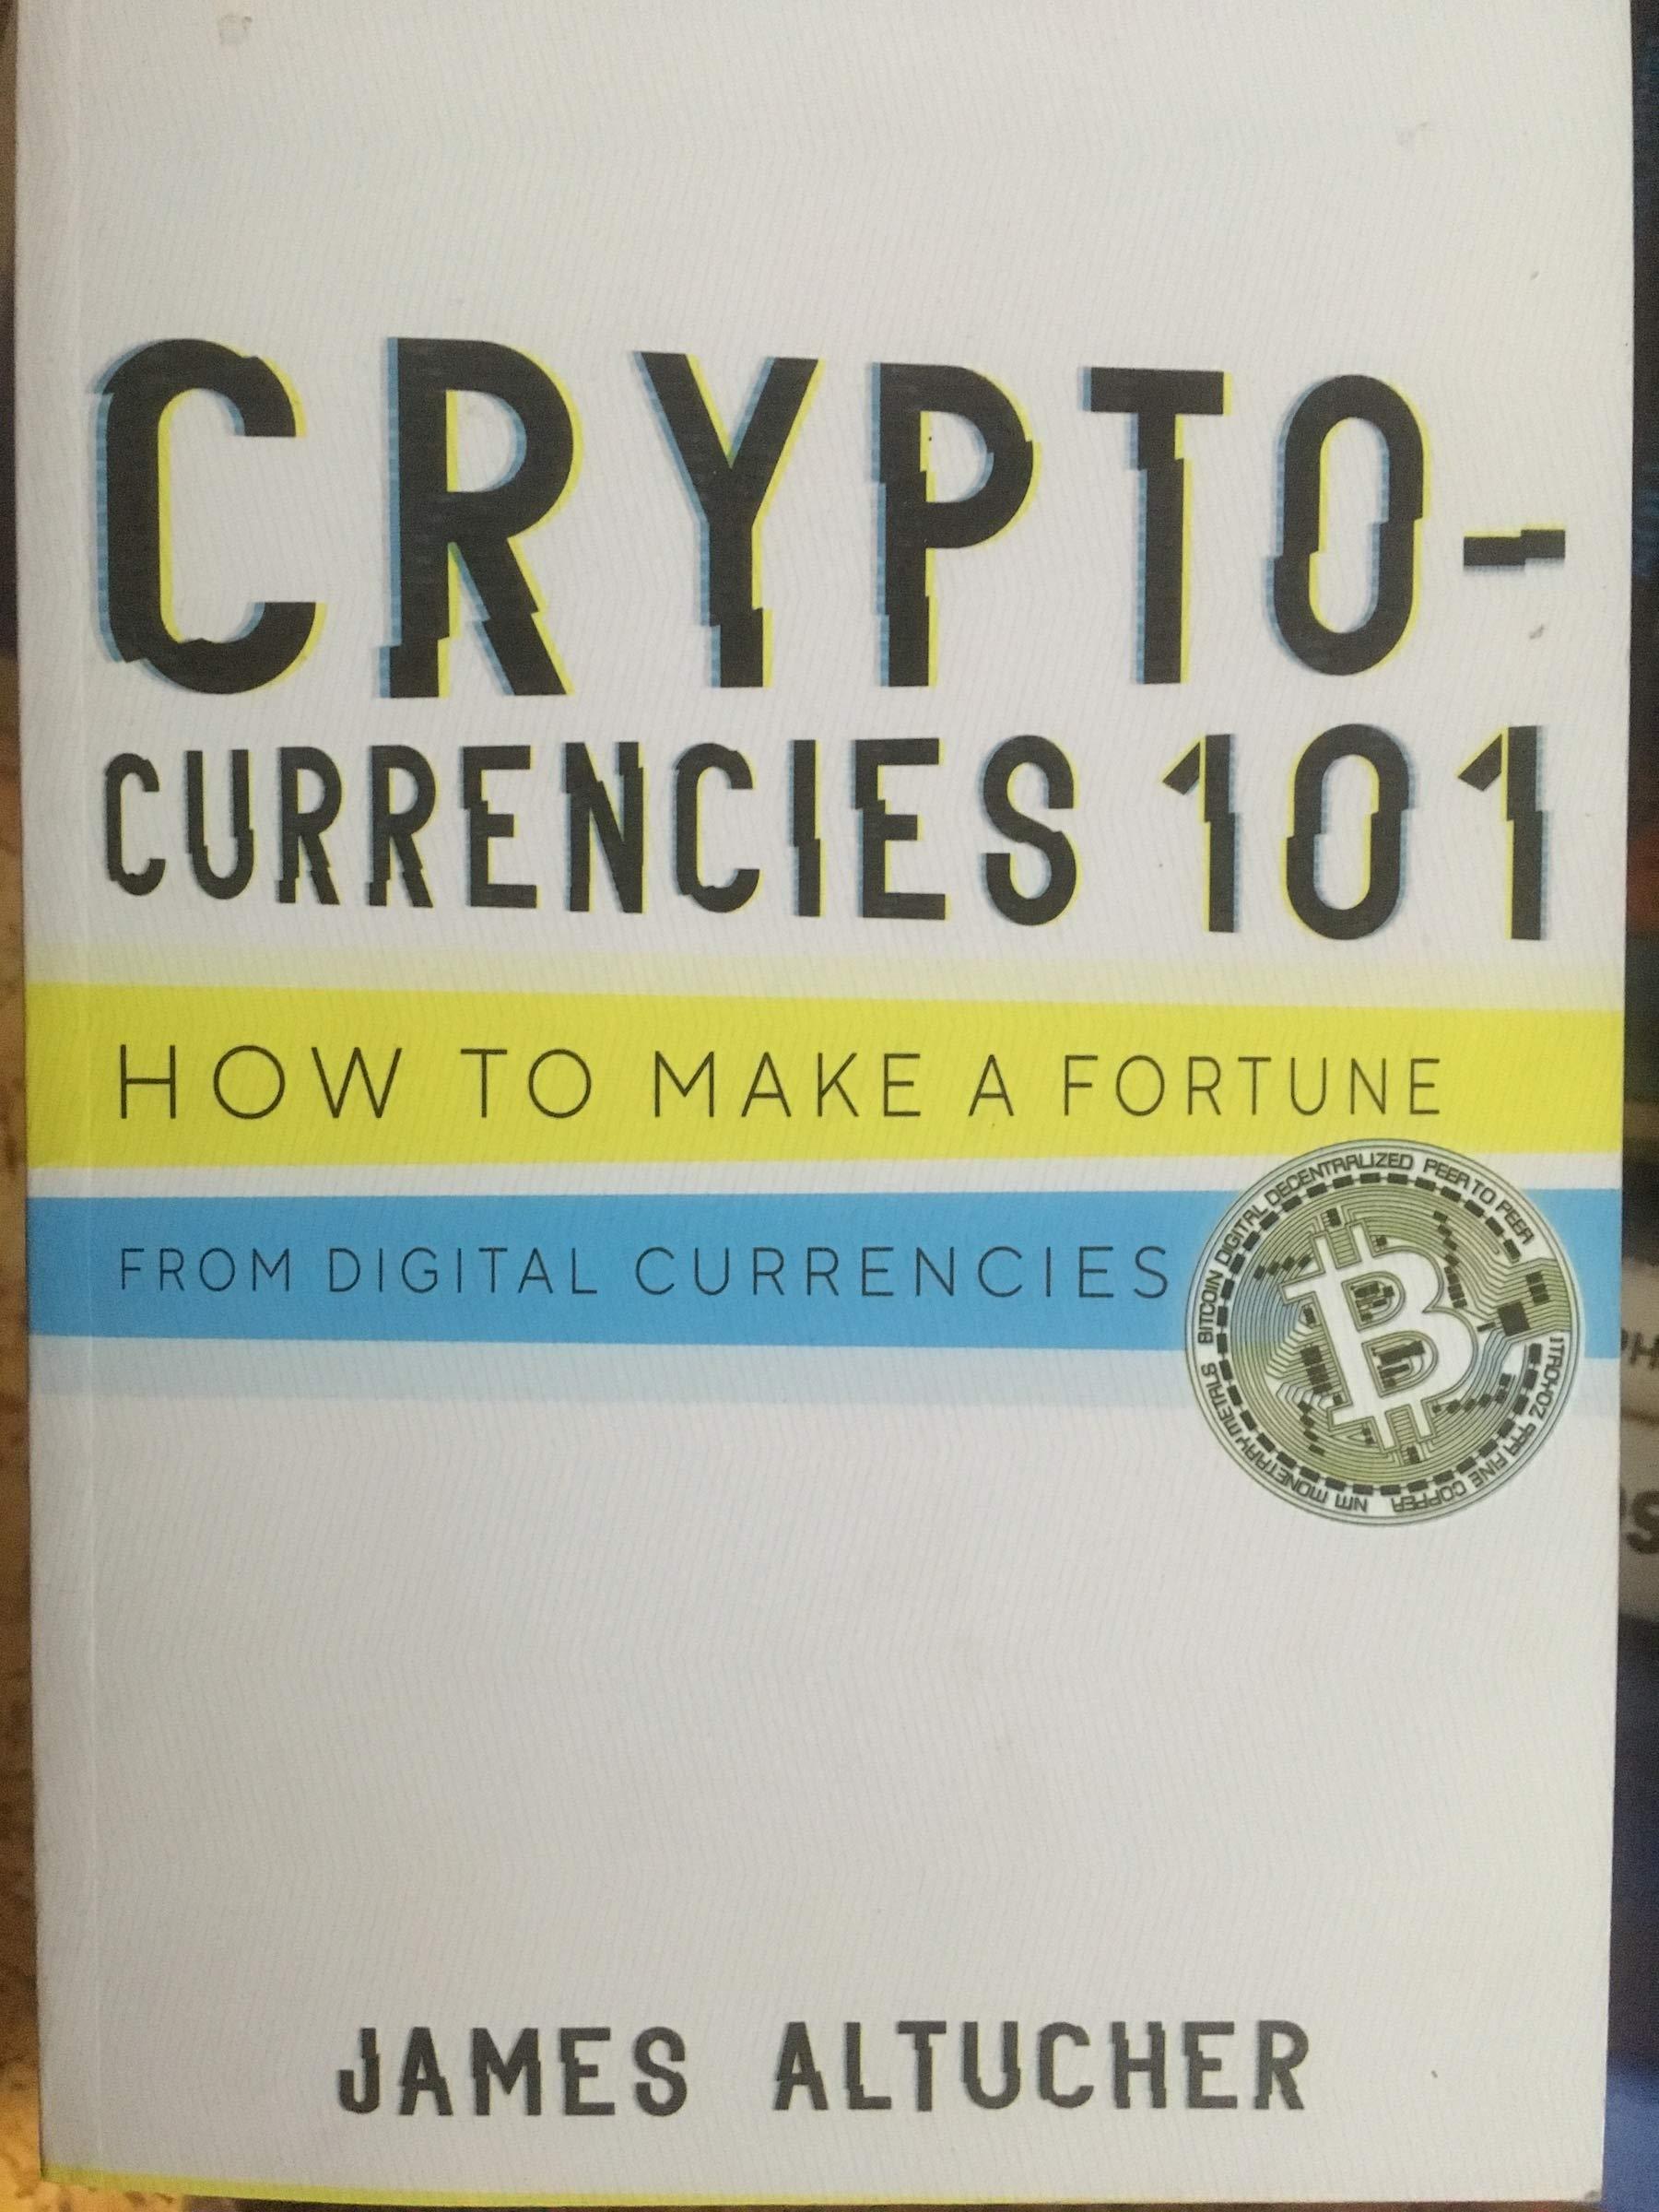 james altucher best cryptocurrency